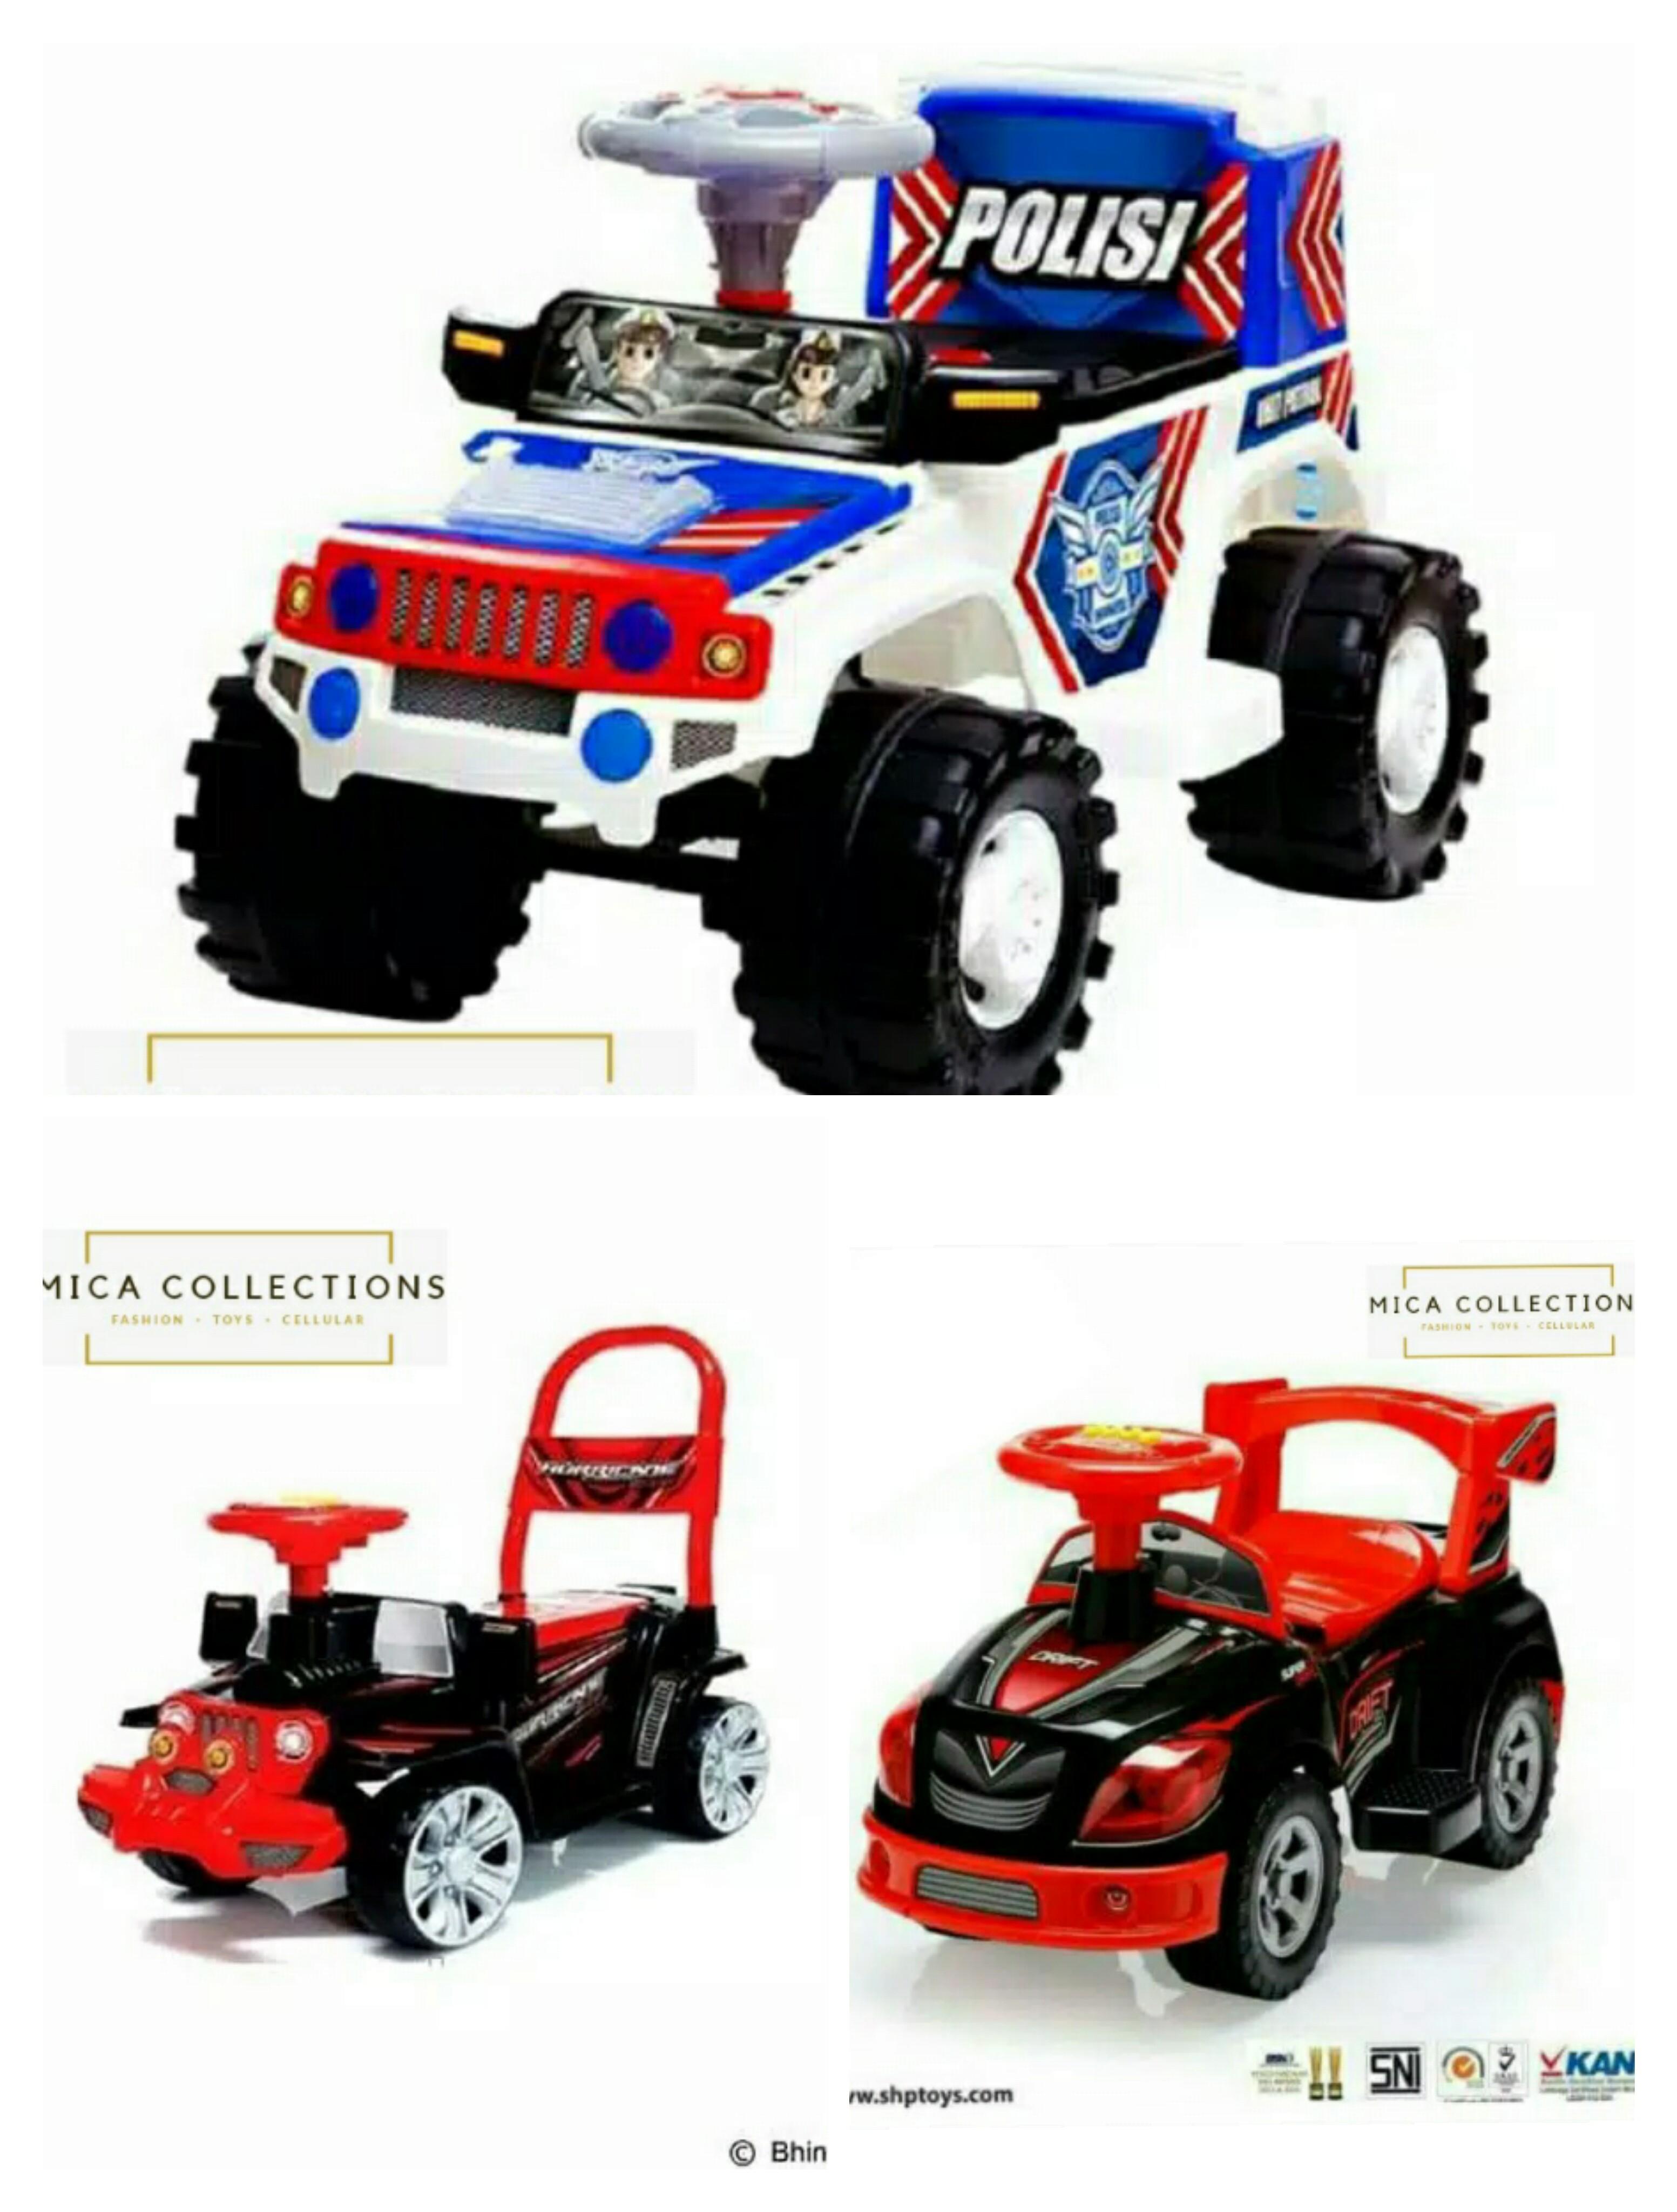 Mc Mobil Dorong Anak Shp Hj 634 Shp Polisi Jeep Sjr600 Shp Sd 606 Murah Lazada Indonesia